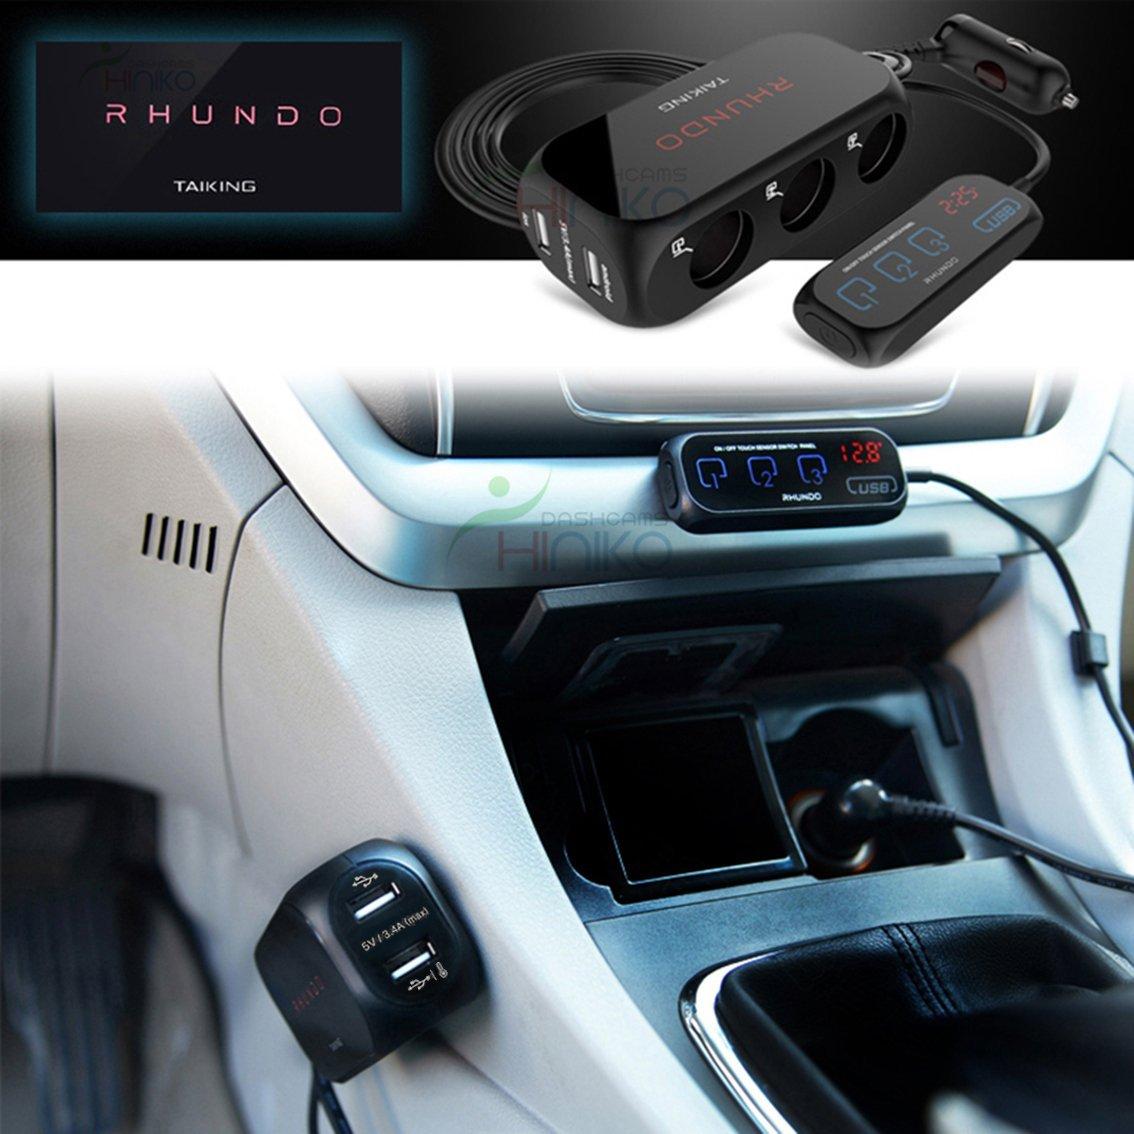 Rhundo Rs 20s 3 Way Car Cigarette Lighter Splitter Adapter Charger Switch